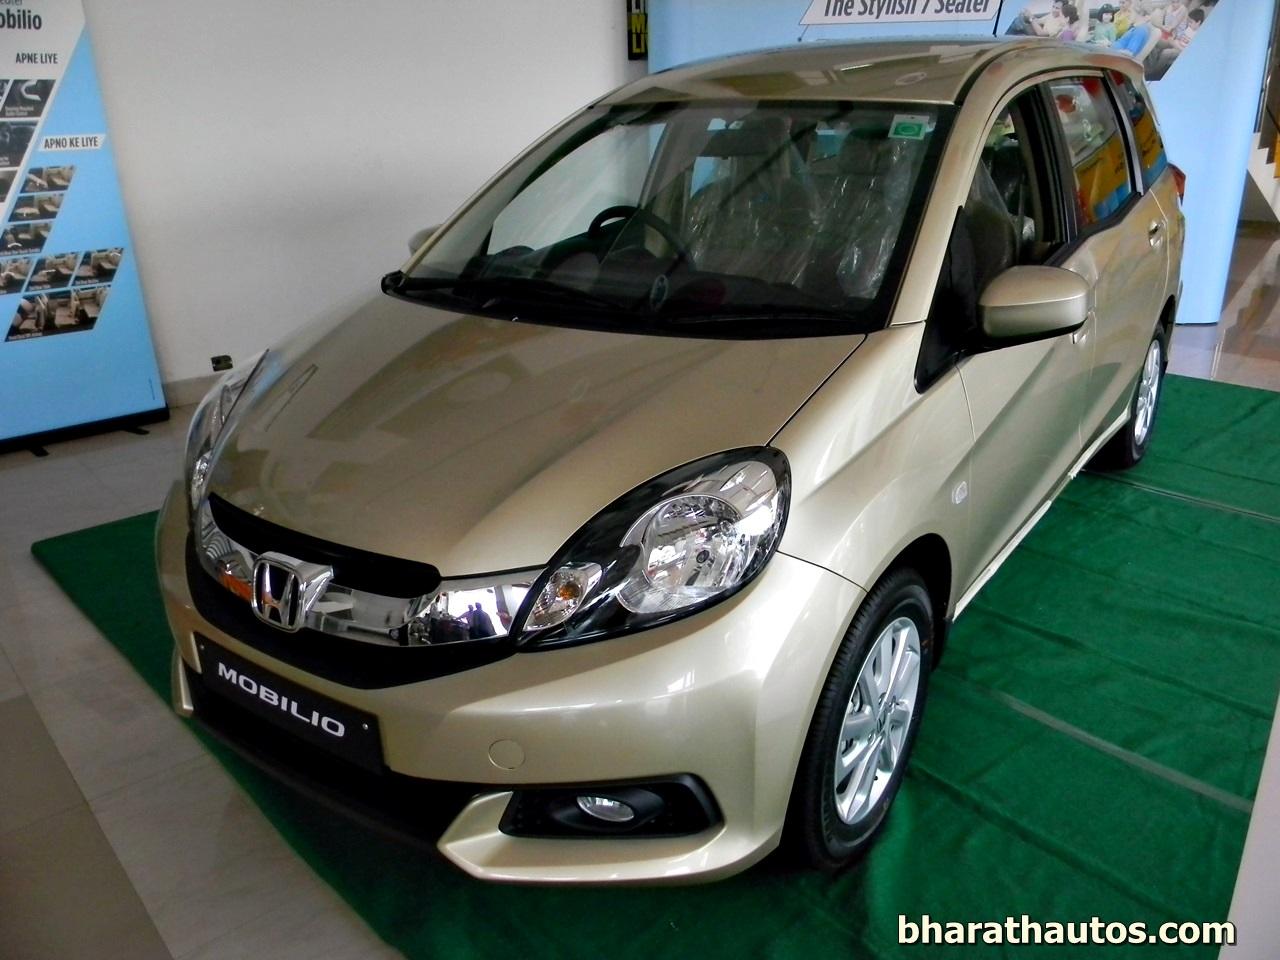 Honda Cars India launched the 7-seater Honda Mobilio MPV ...